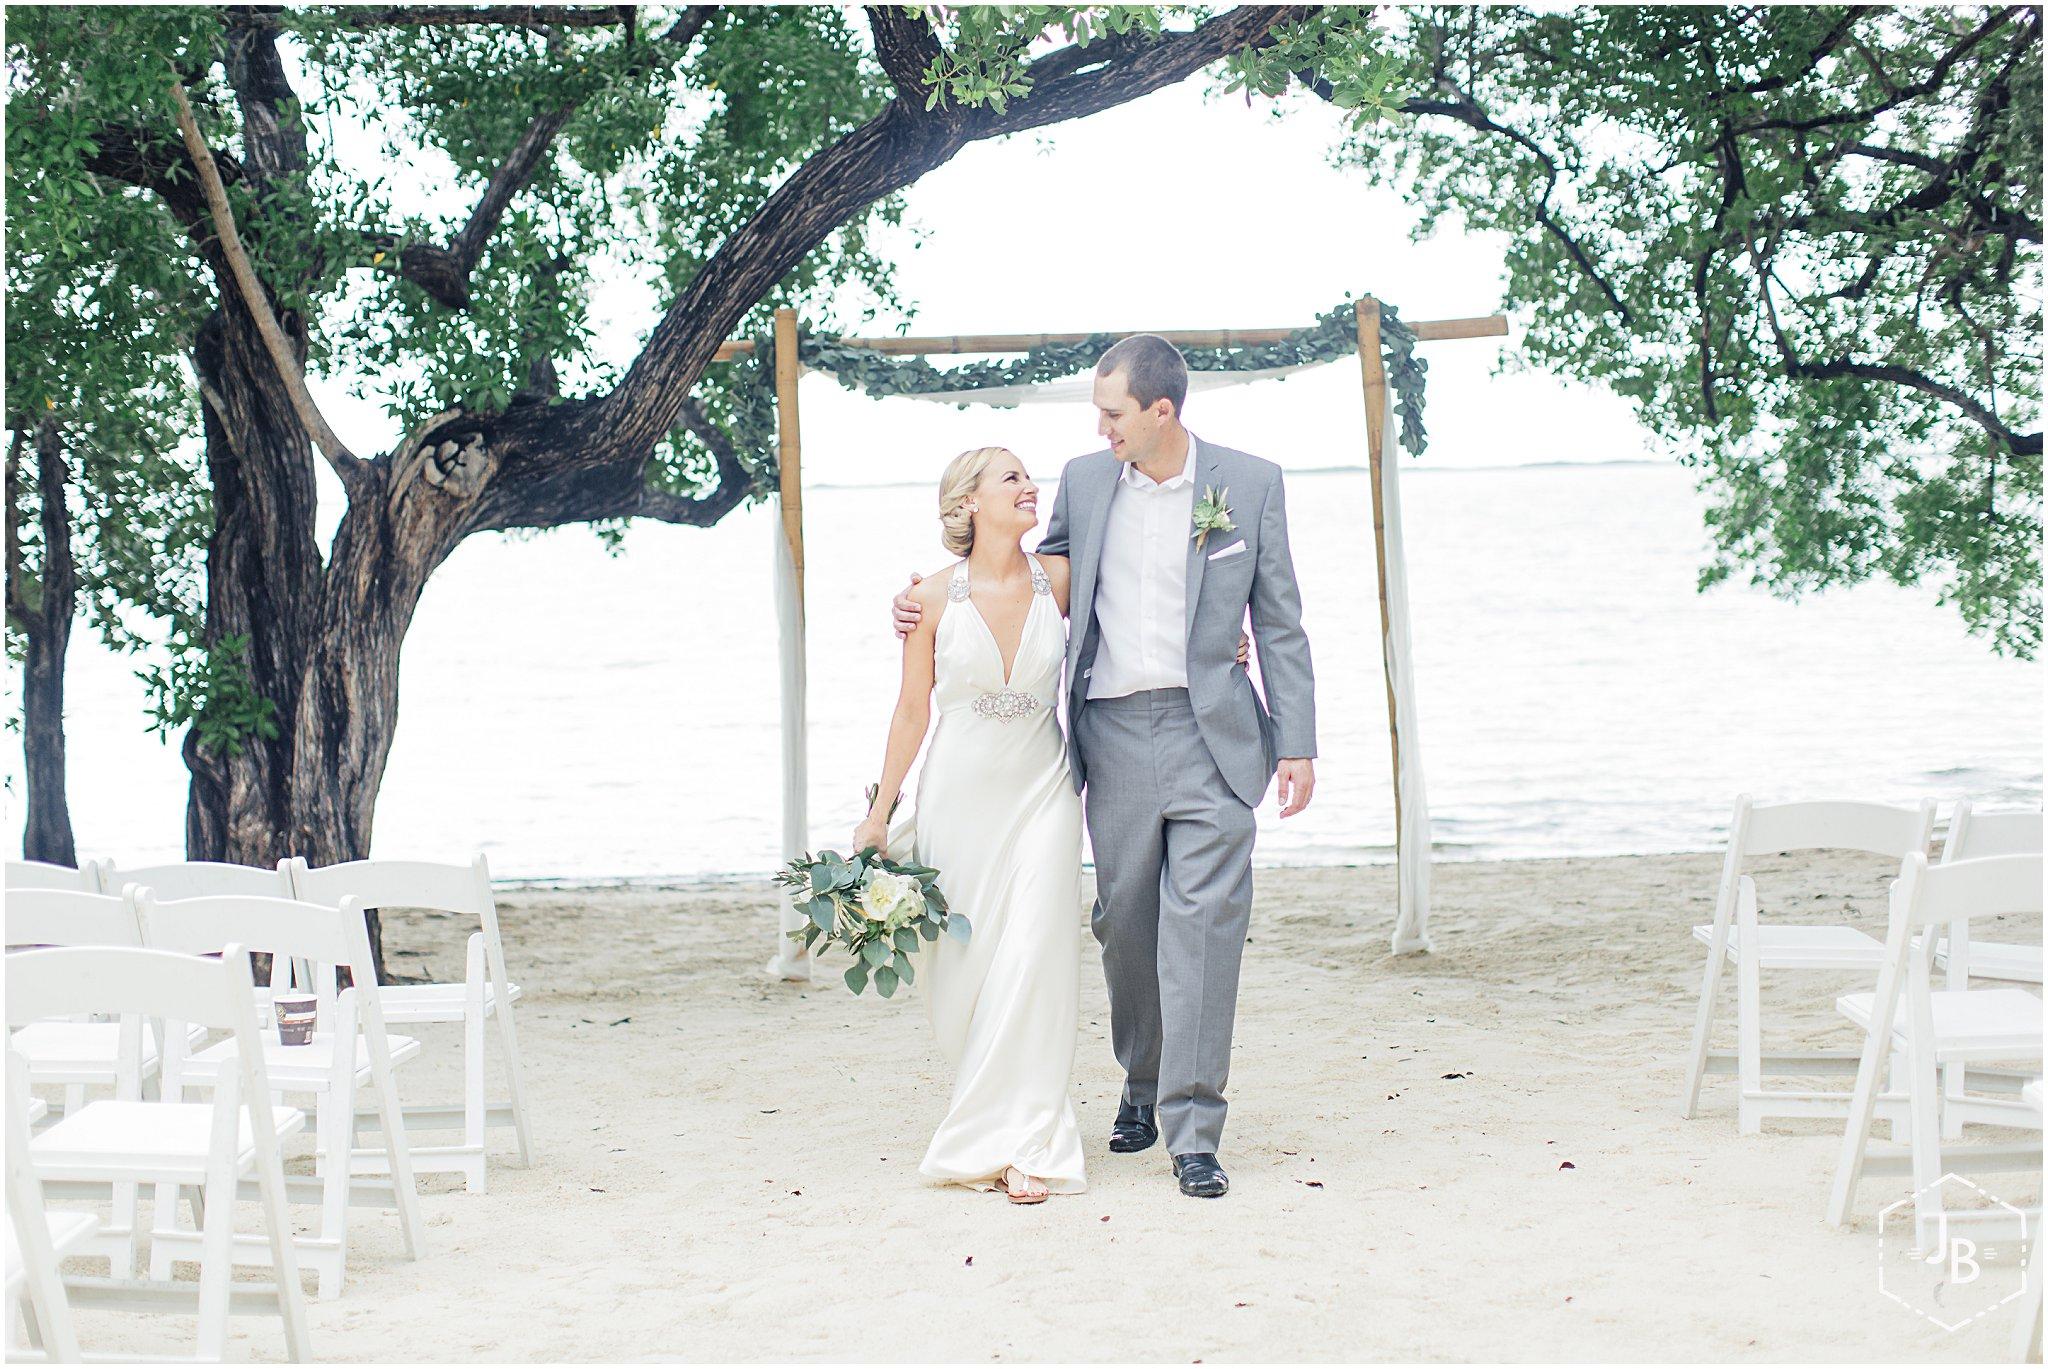 WeddingandEngagementFloridaPhotographer_1134.jpg